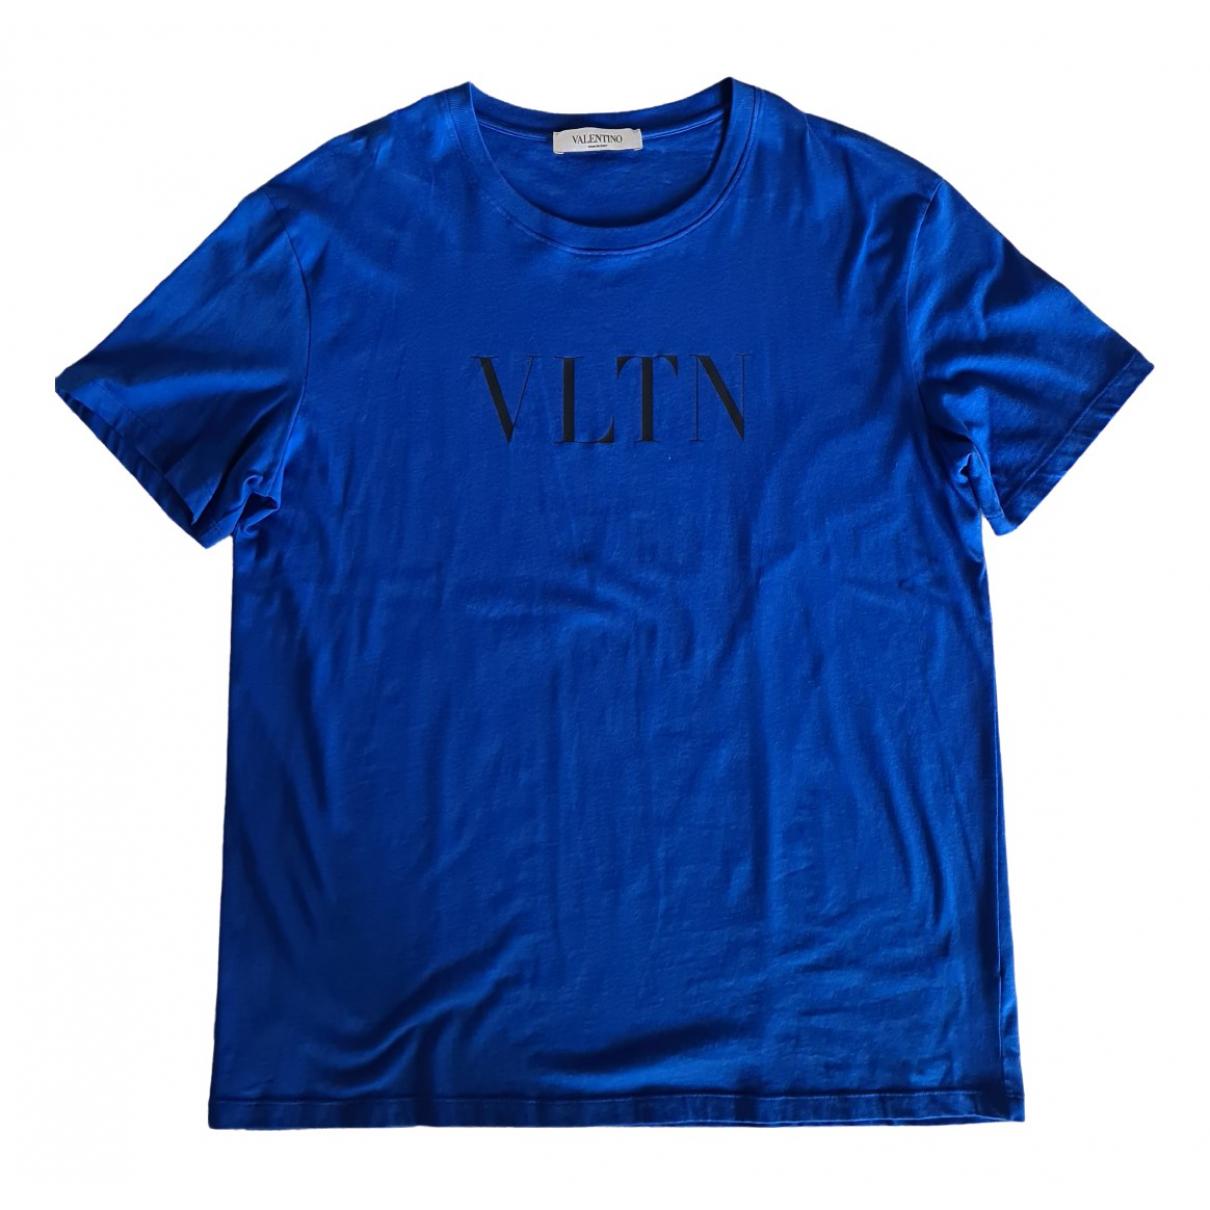 Valentino Garavani - Tee shirts   pour homme en coton - bleu